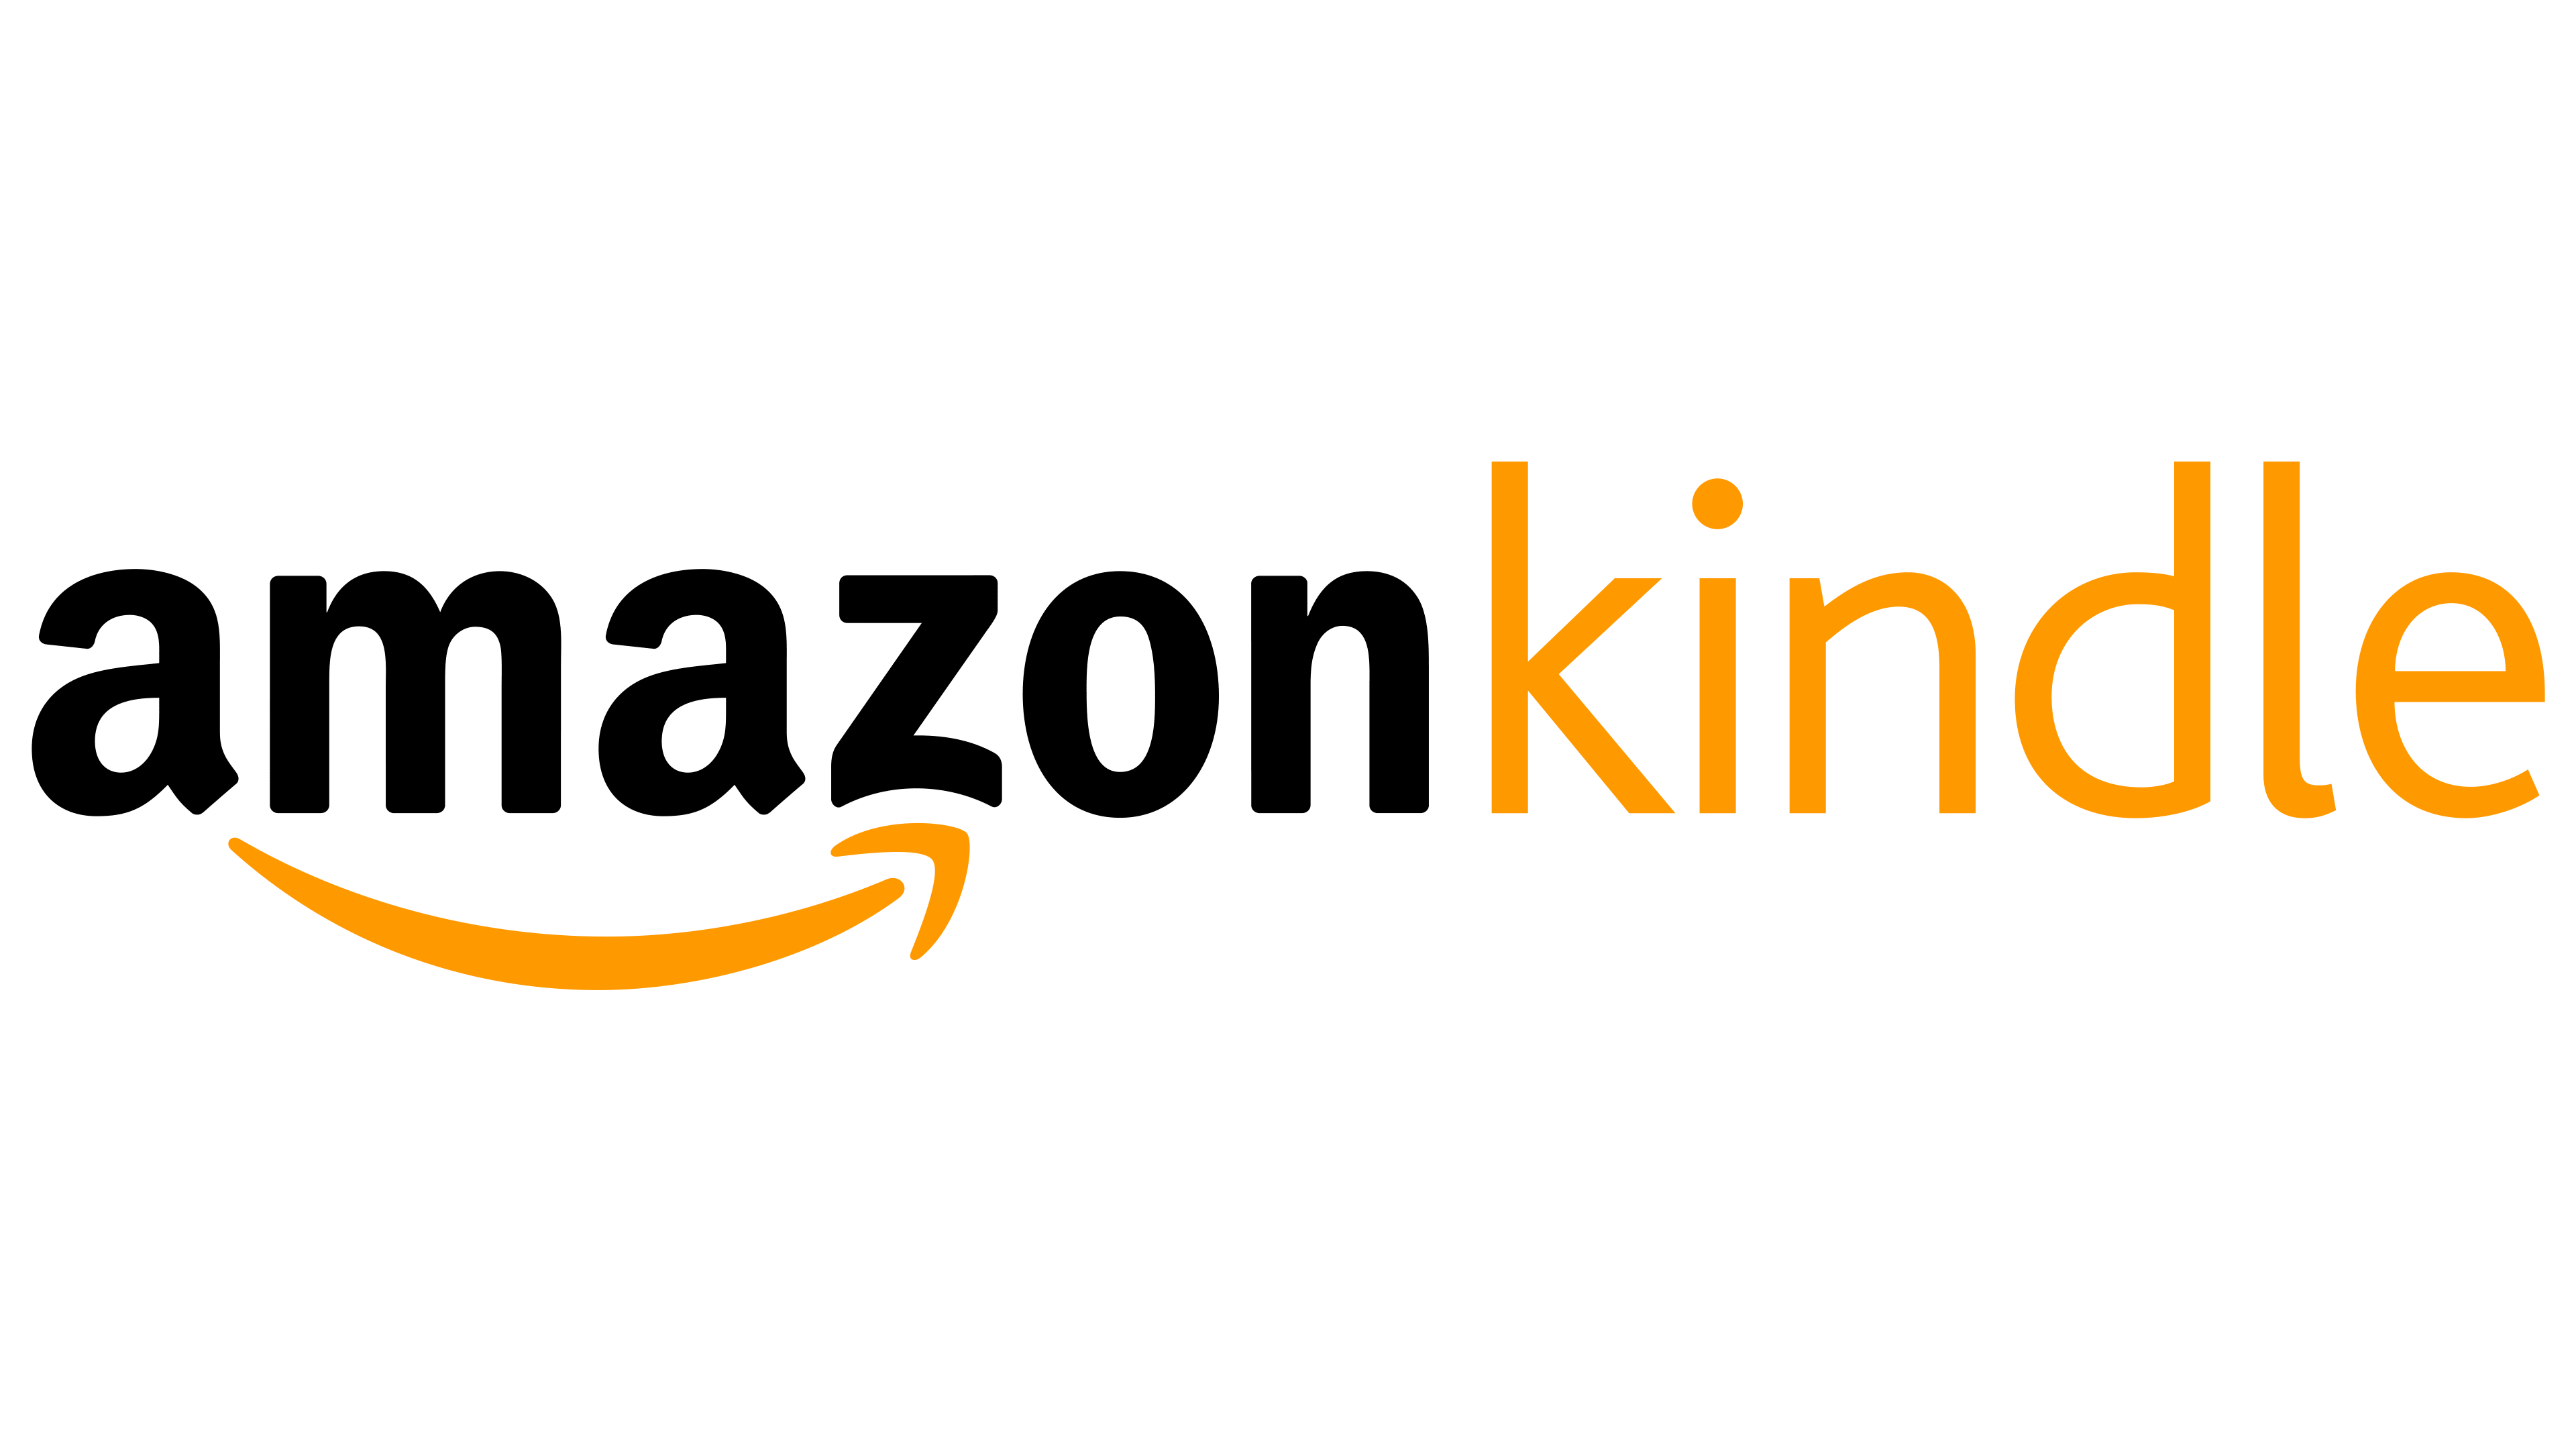 https://controlfreak.com.sg/wp-content/uploads/2021/01/Amazon-Kindle-logo-1.png